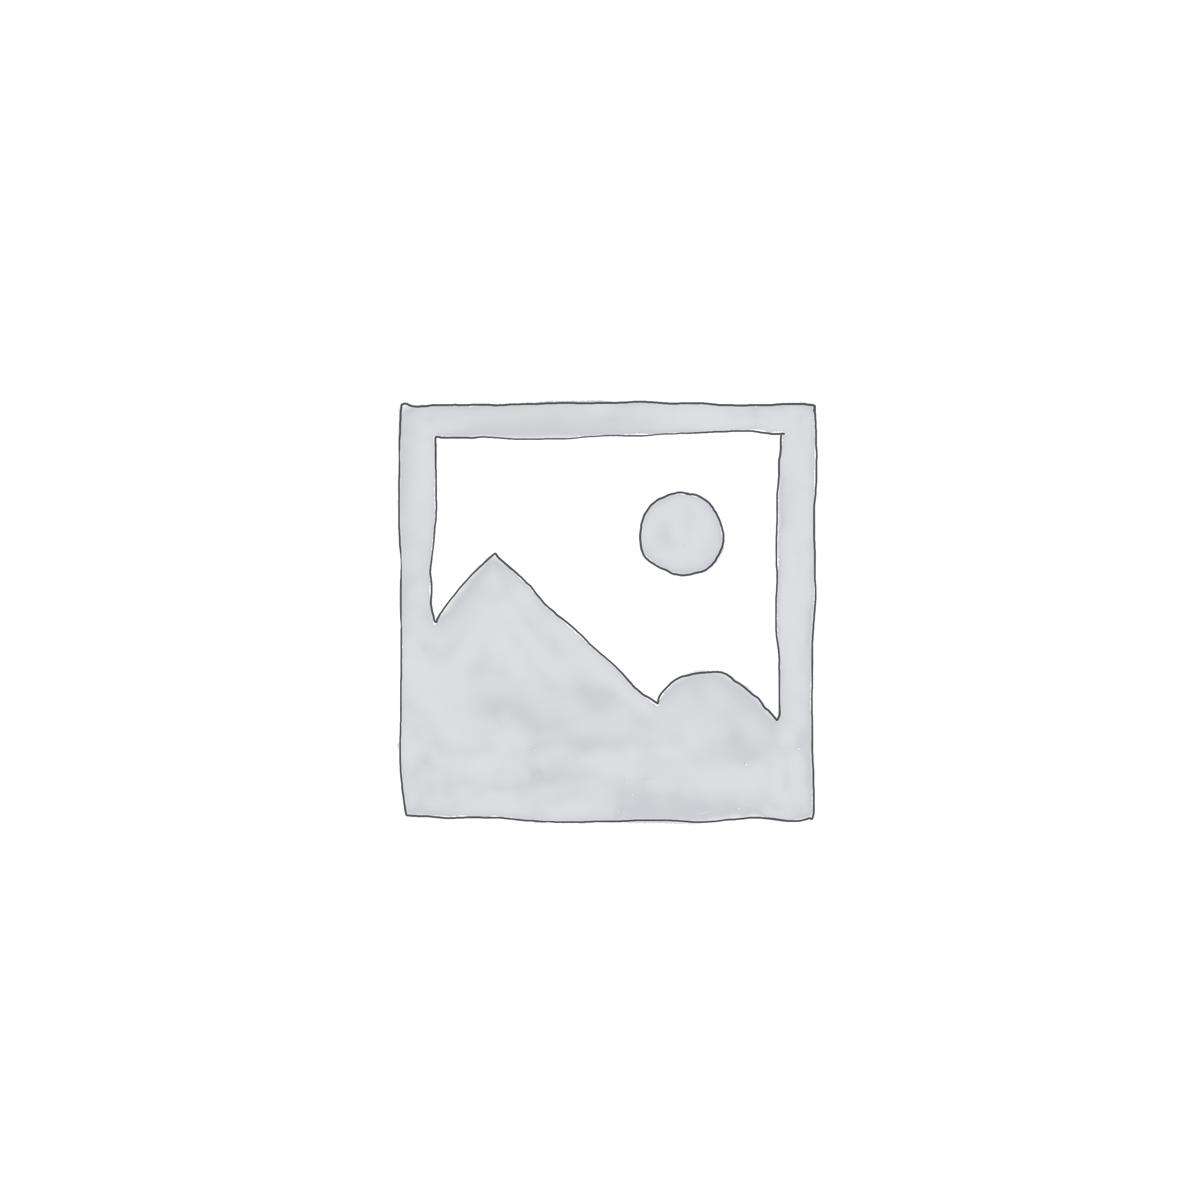 Misty Mountain Green Forest Scenic Wallpaper Mural